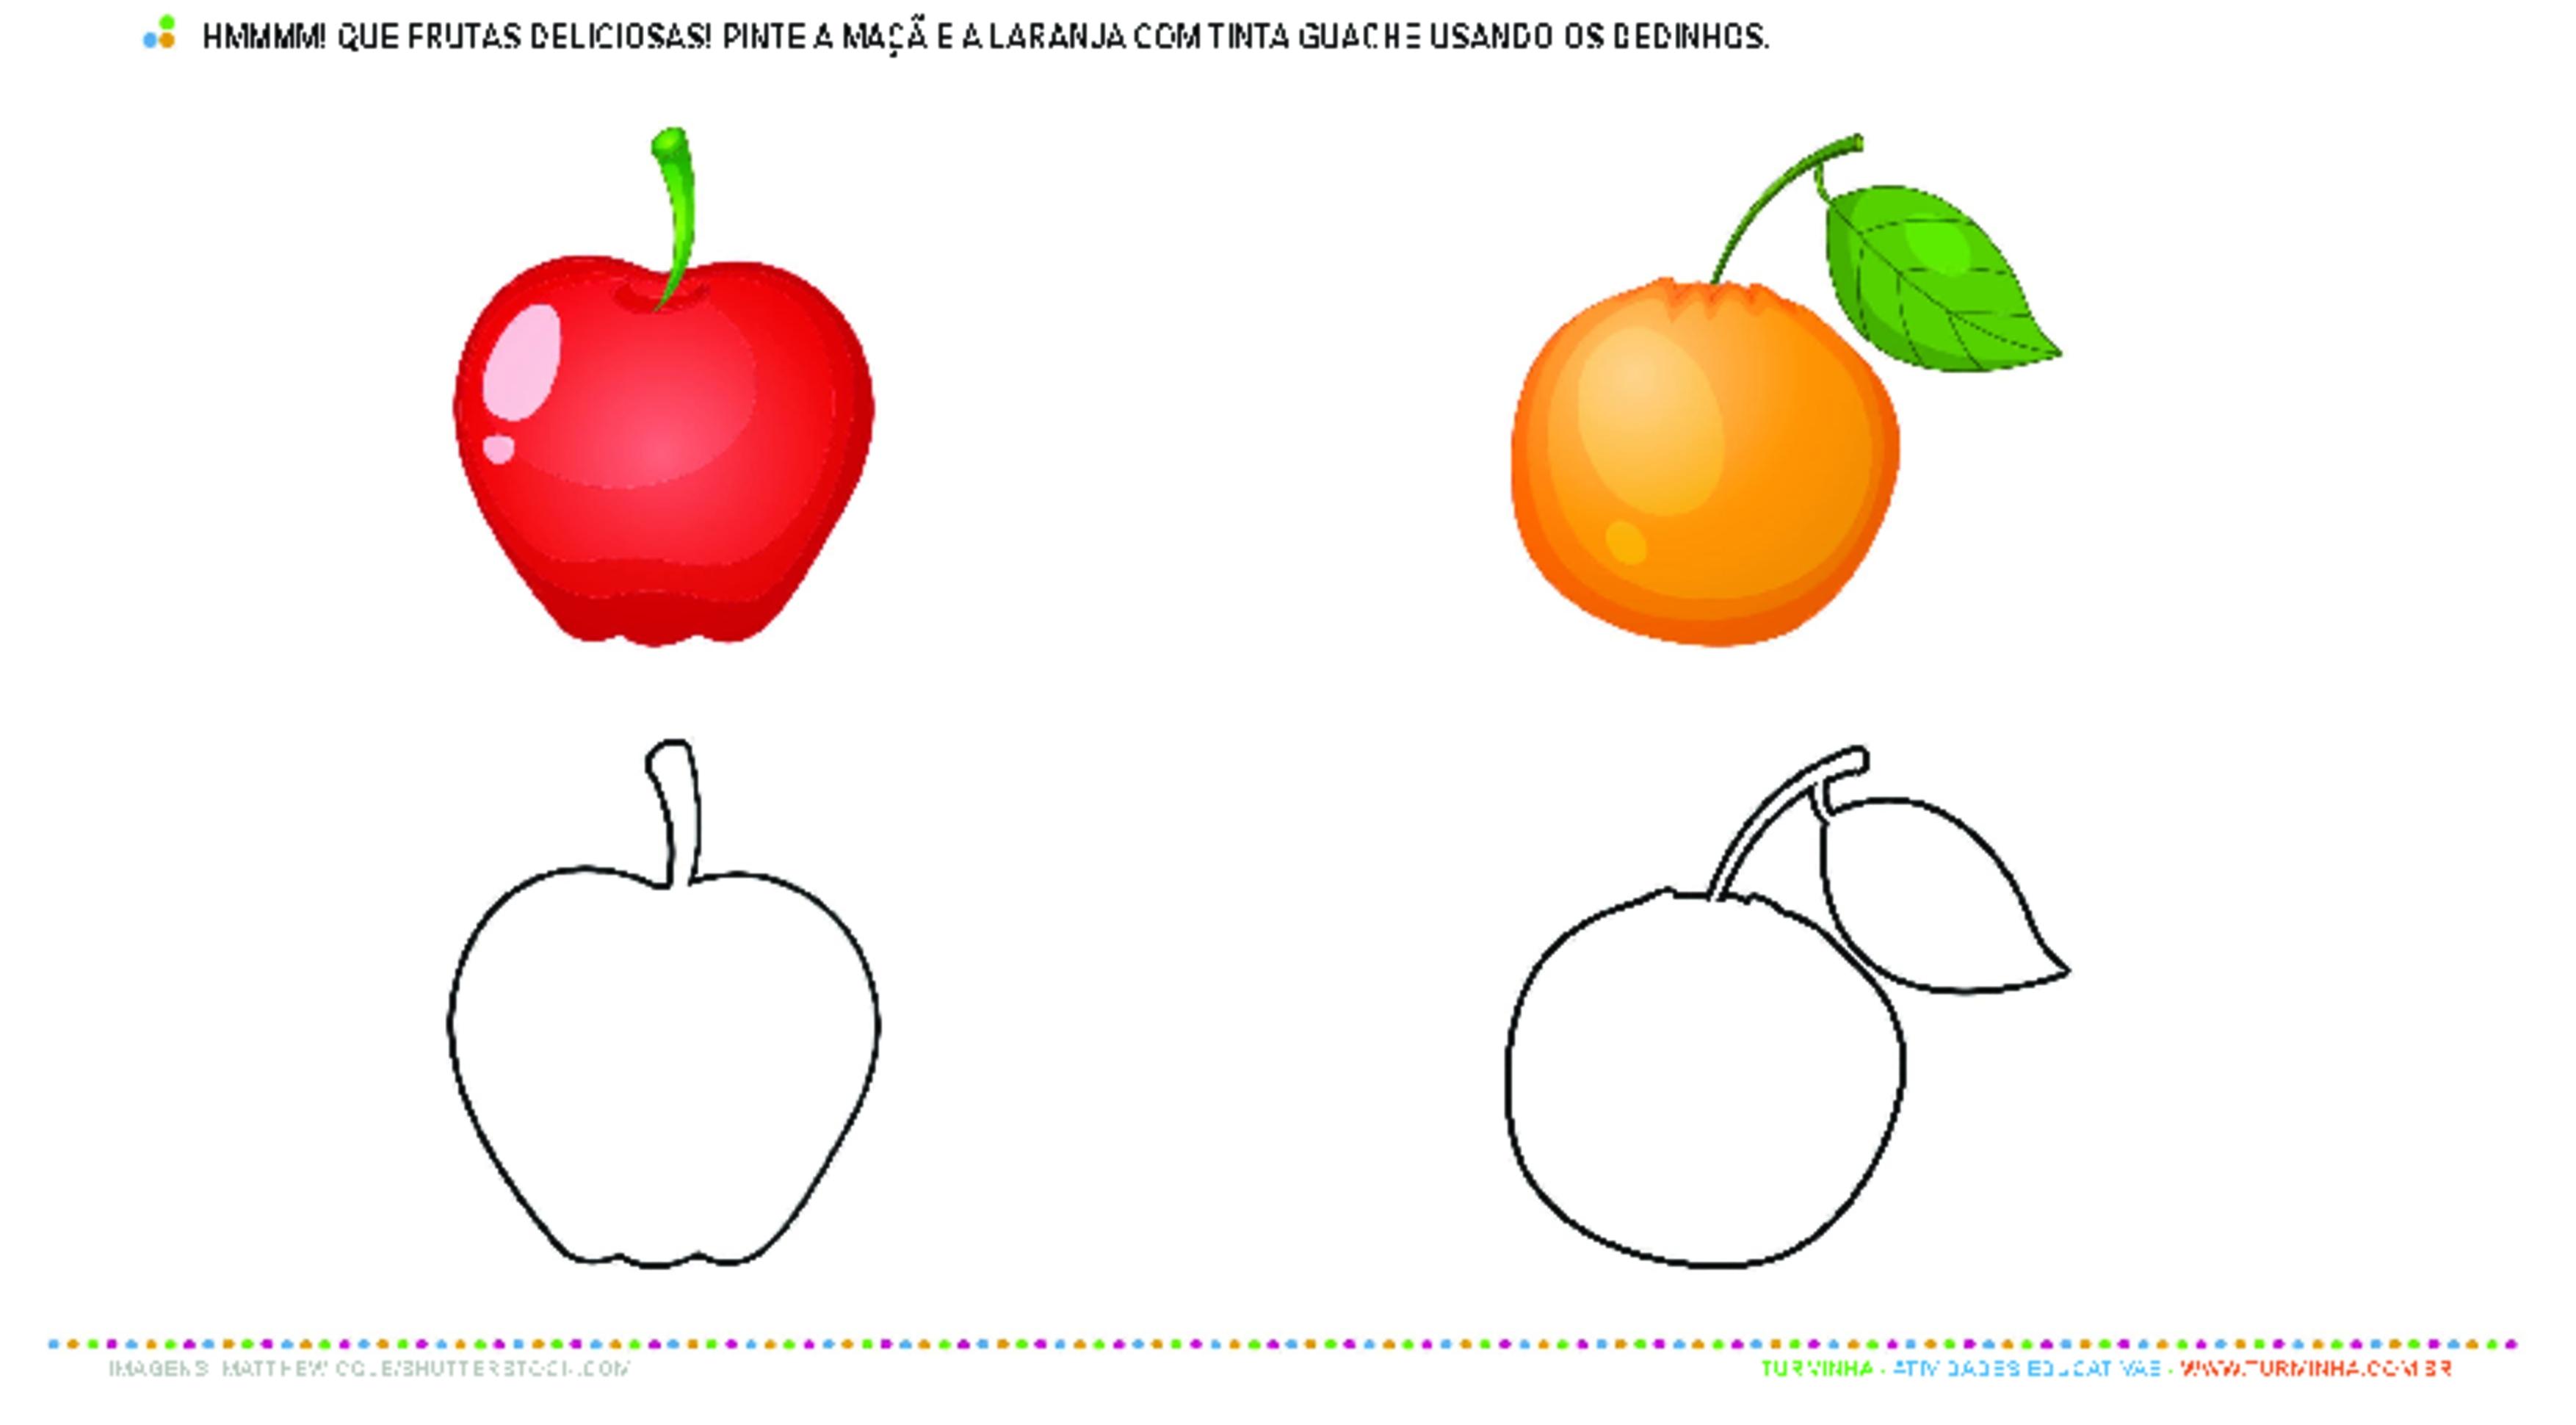 Identificando padrões e cores - atividade educativa para Creche (0 a 3 anos)